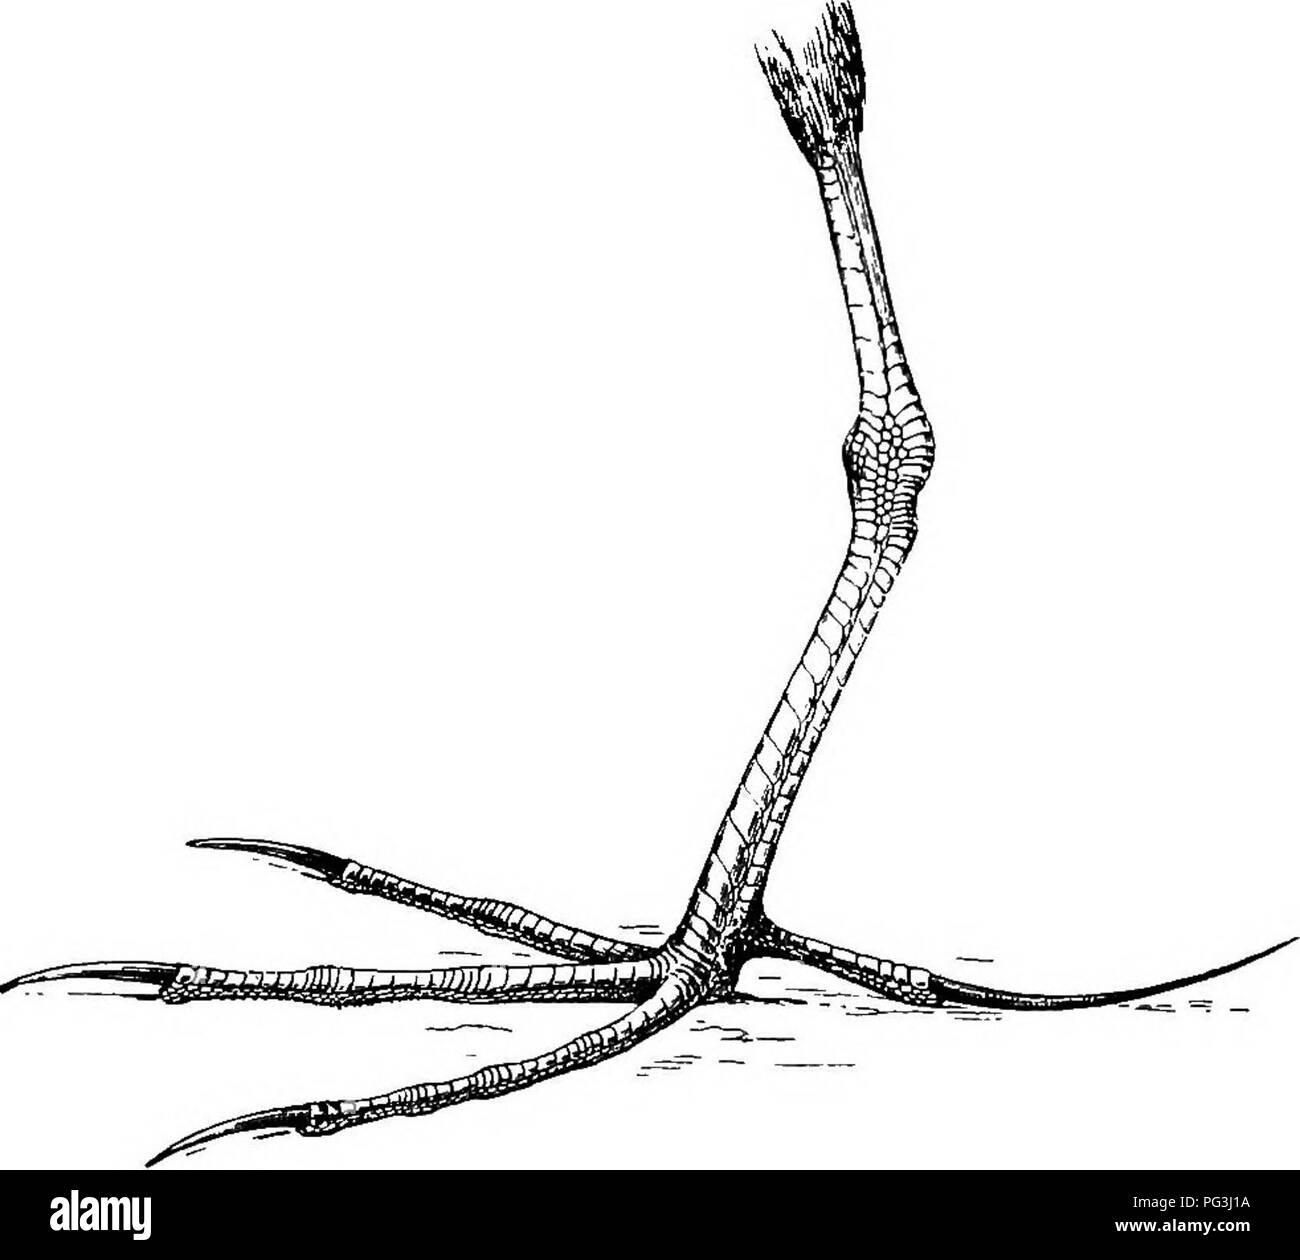 . The birds of South Africa. Birds. 338 PAEEIDJ3 ACTOPHILUS 713. Actophilus africanus. African Jacana. Parra africana, Gmel. Syst. Nat. i, p. 709 (1788); Swains. Zool. Illustr., 2nd ser., pi. 6 (1829); Gurney, Ibis, 1859, p. 249, 1862, p. 38 [Natal] ; KirJc, Ibis, 1864, p. 334; Layard, B. S. Afr. p. 335 (1867); Gurney, in Andersson's B. Bamaral. p. 328 (1872); Shelley, Ibis, 1875, p. 86; Forbes, P. Z. S. 1881, p. 639; Holub ^ Pelzeln, Om. Sud-Afr. p. 296 (1882); Shelley, Ibis, 1882, p. 367 [Koomoorooi. Fig. 108.—Left foot of ActopMlus africanus. x I. Pan] ; Sharpe, ed. Bayard's B. S. Afr. p. 6 - Stock Image